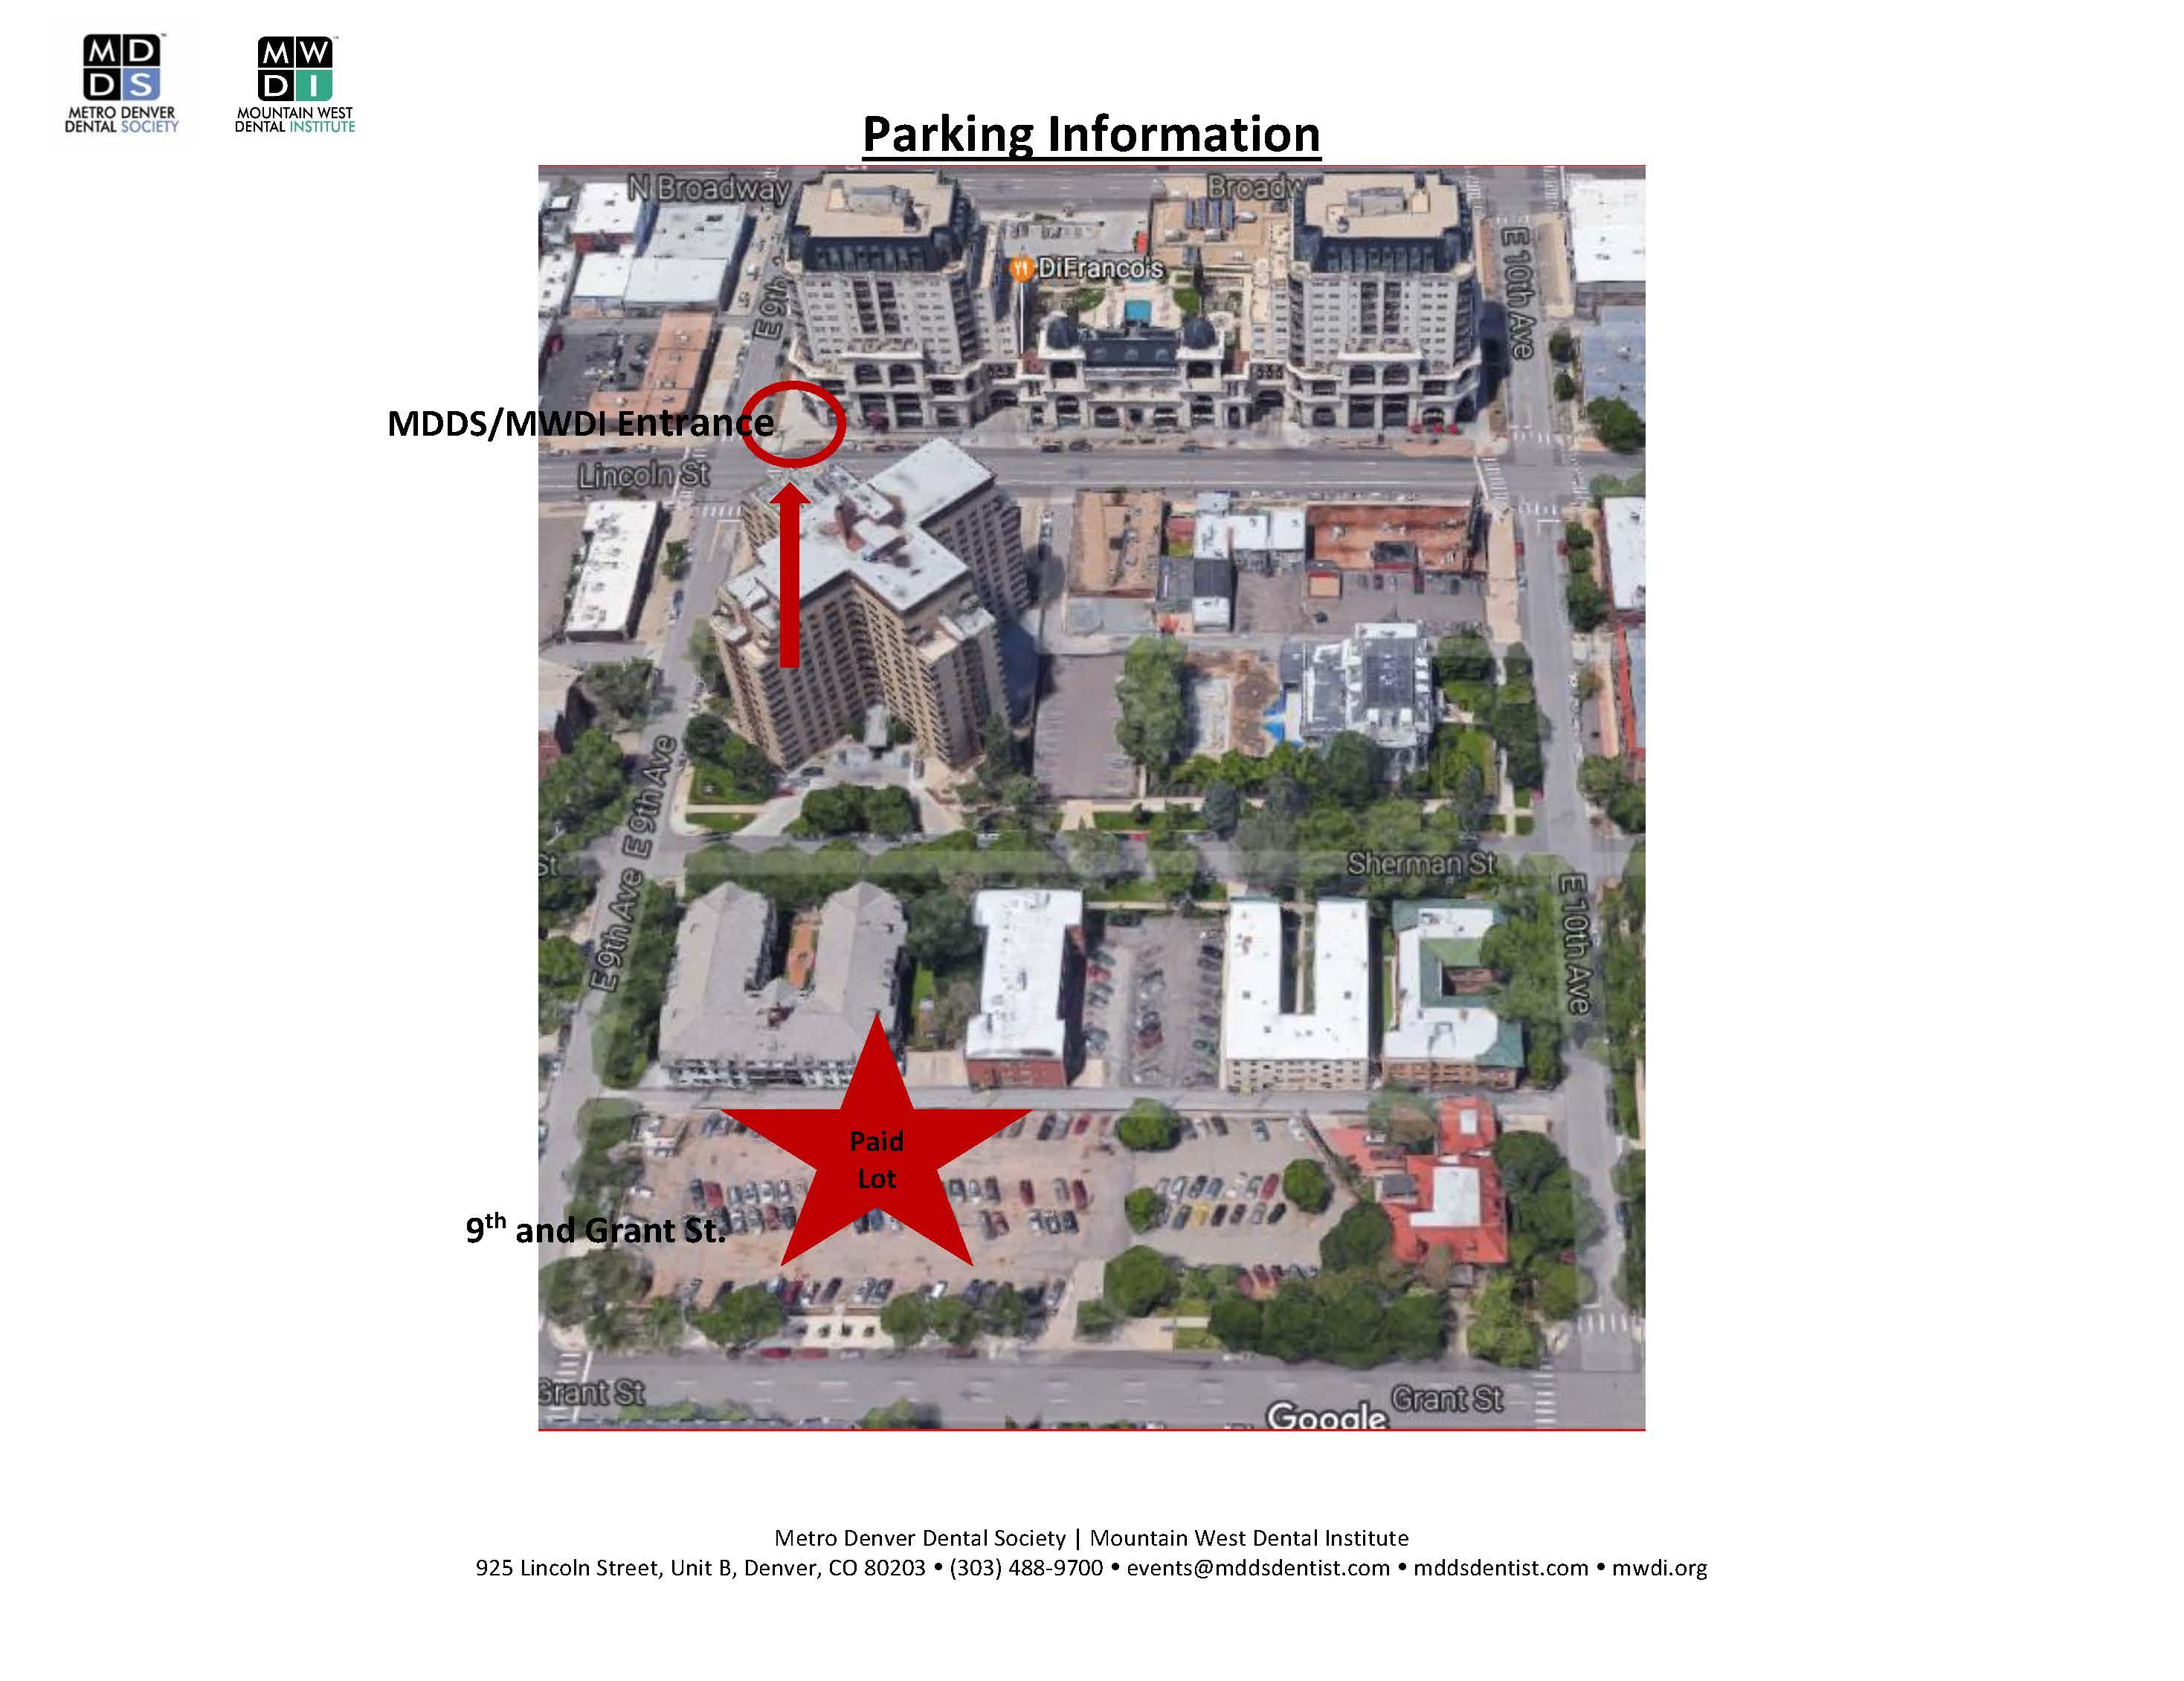 Mountain West Dental Institute (MWDI) Parking Map